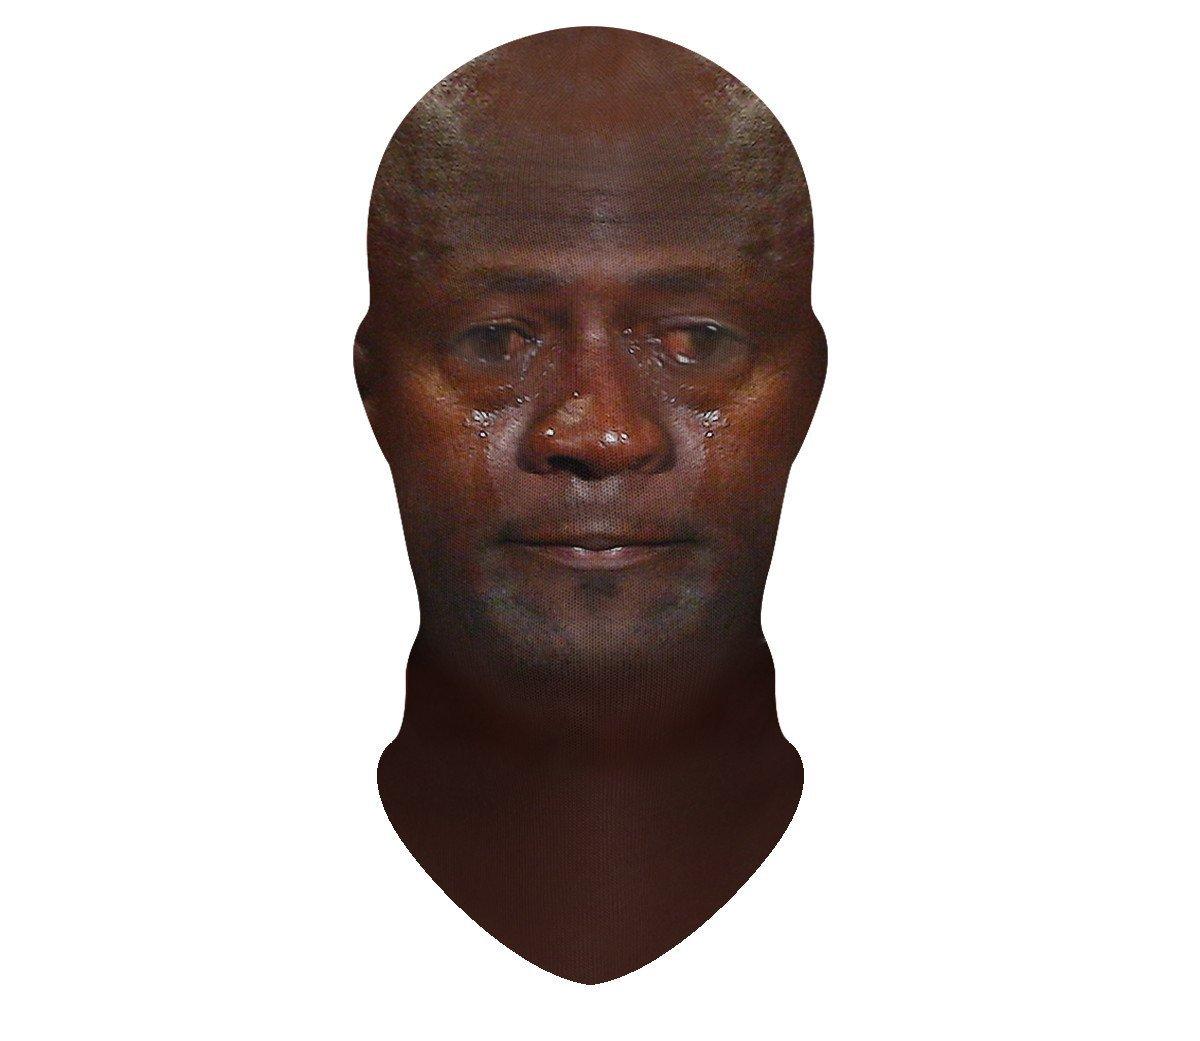 Beloved Shirts Crying Jordan Face Mask